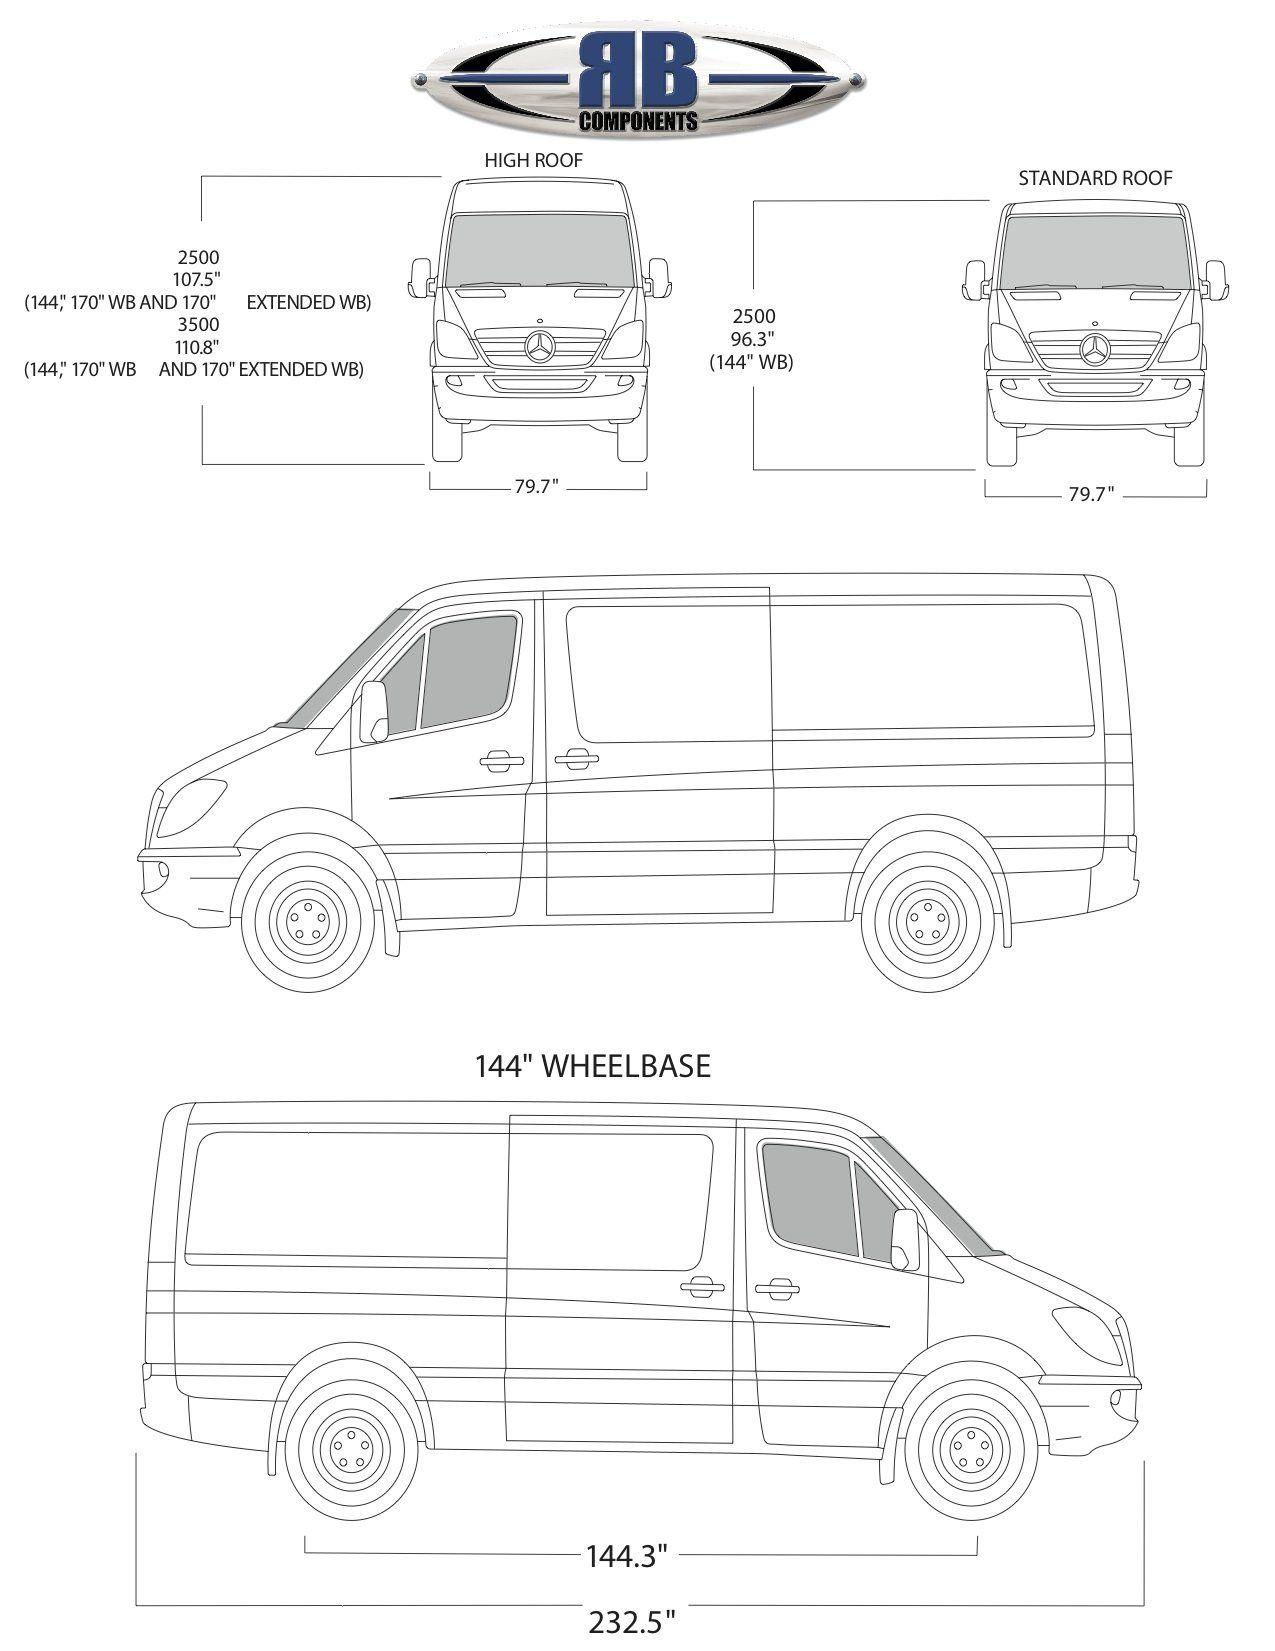 Sprinter Floorplan Templates 144 170 170 Ext Mercedes Sprinter Camper Sprinter Camper Conversion Sprinter Van